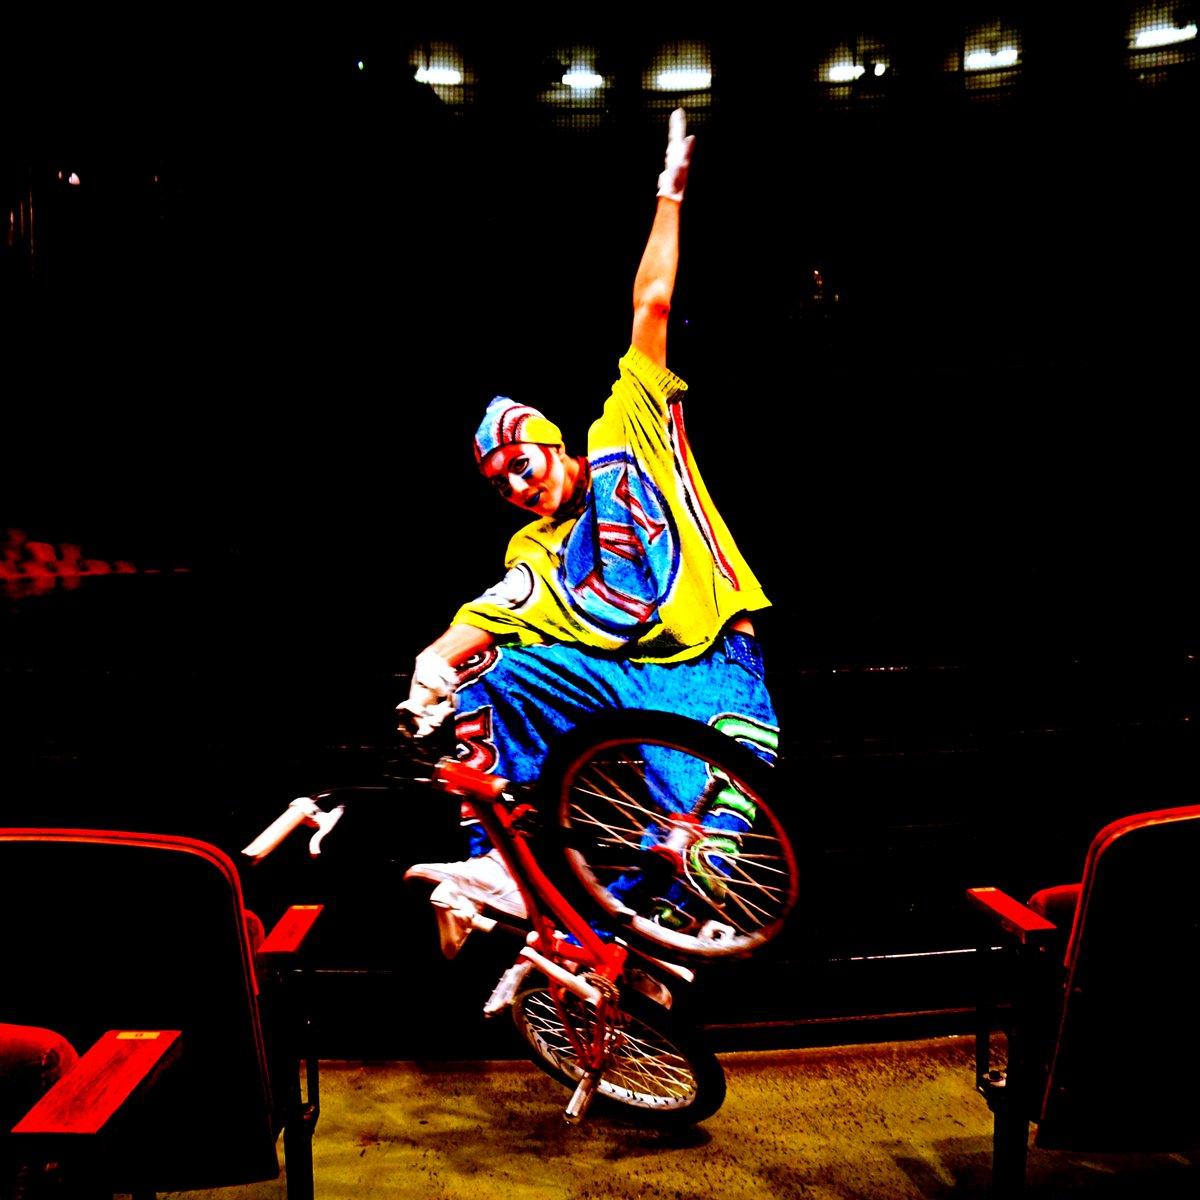 ◆RT希望◆  BMXライダー池田貴広が【シルク・ドゥ・ソレイユ】の常設公演『La Nouba(フロリダ)』に出演決定!  概要 http://t.co/mCiz4Kq4Af   #CirqueDuSoleil #LaNouba http://t.co/5ccIy8FEri